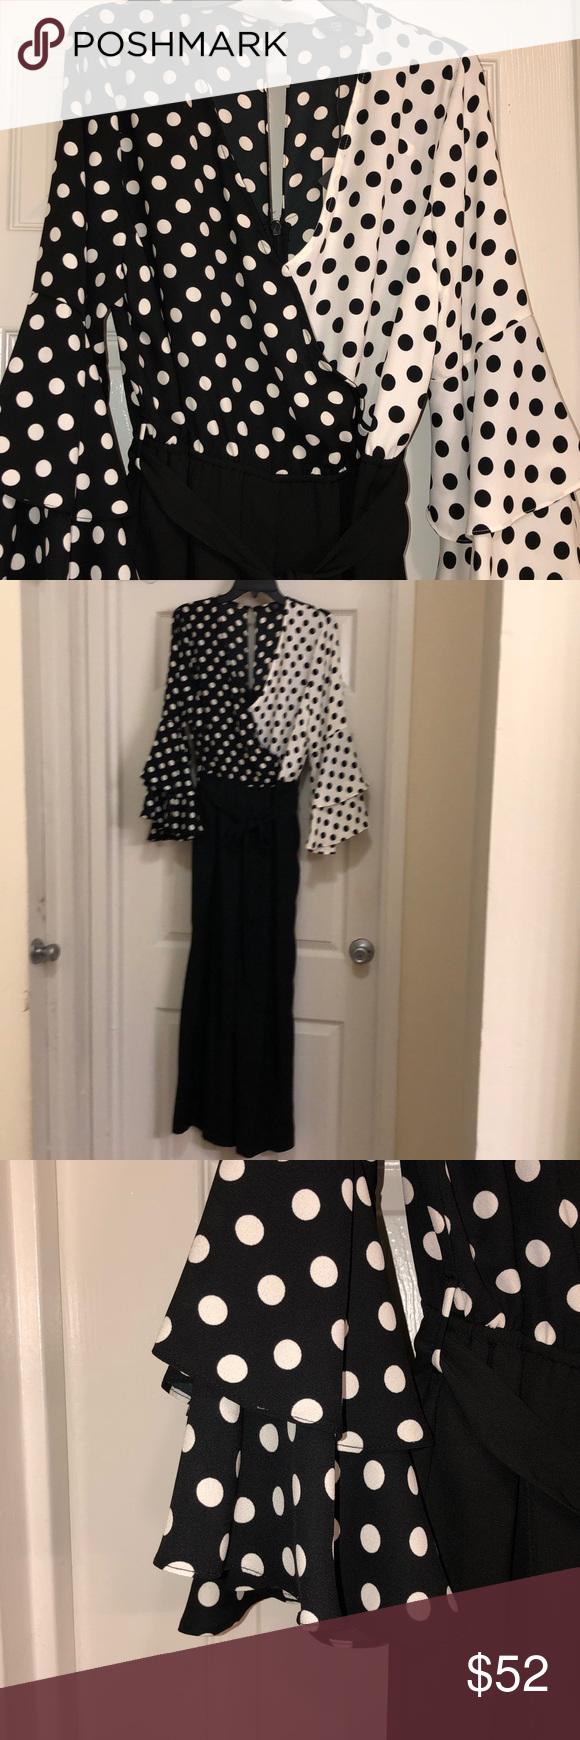 82fff41e466 River Island Plus Polka Dot Frill Sleeve Jumpsuit Monochrome style ...